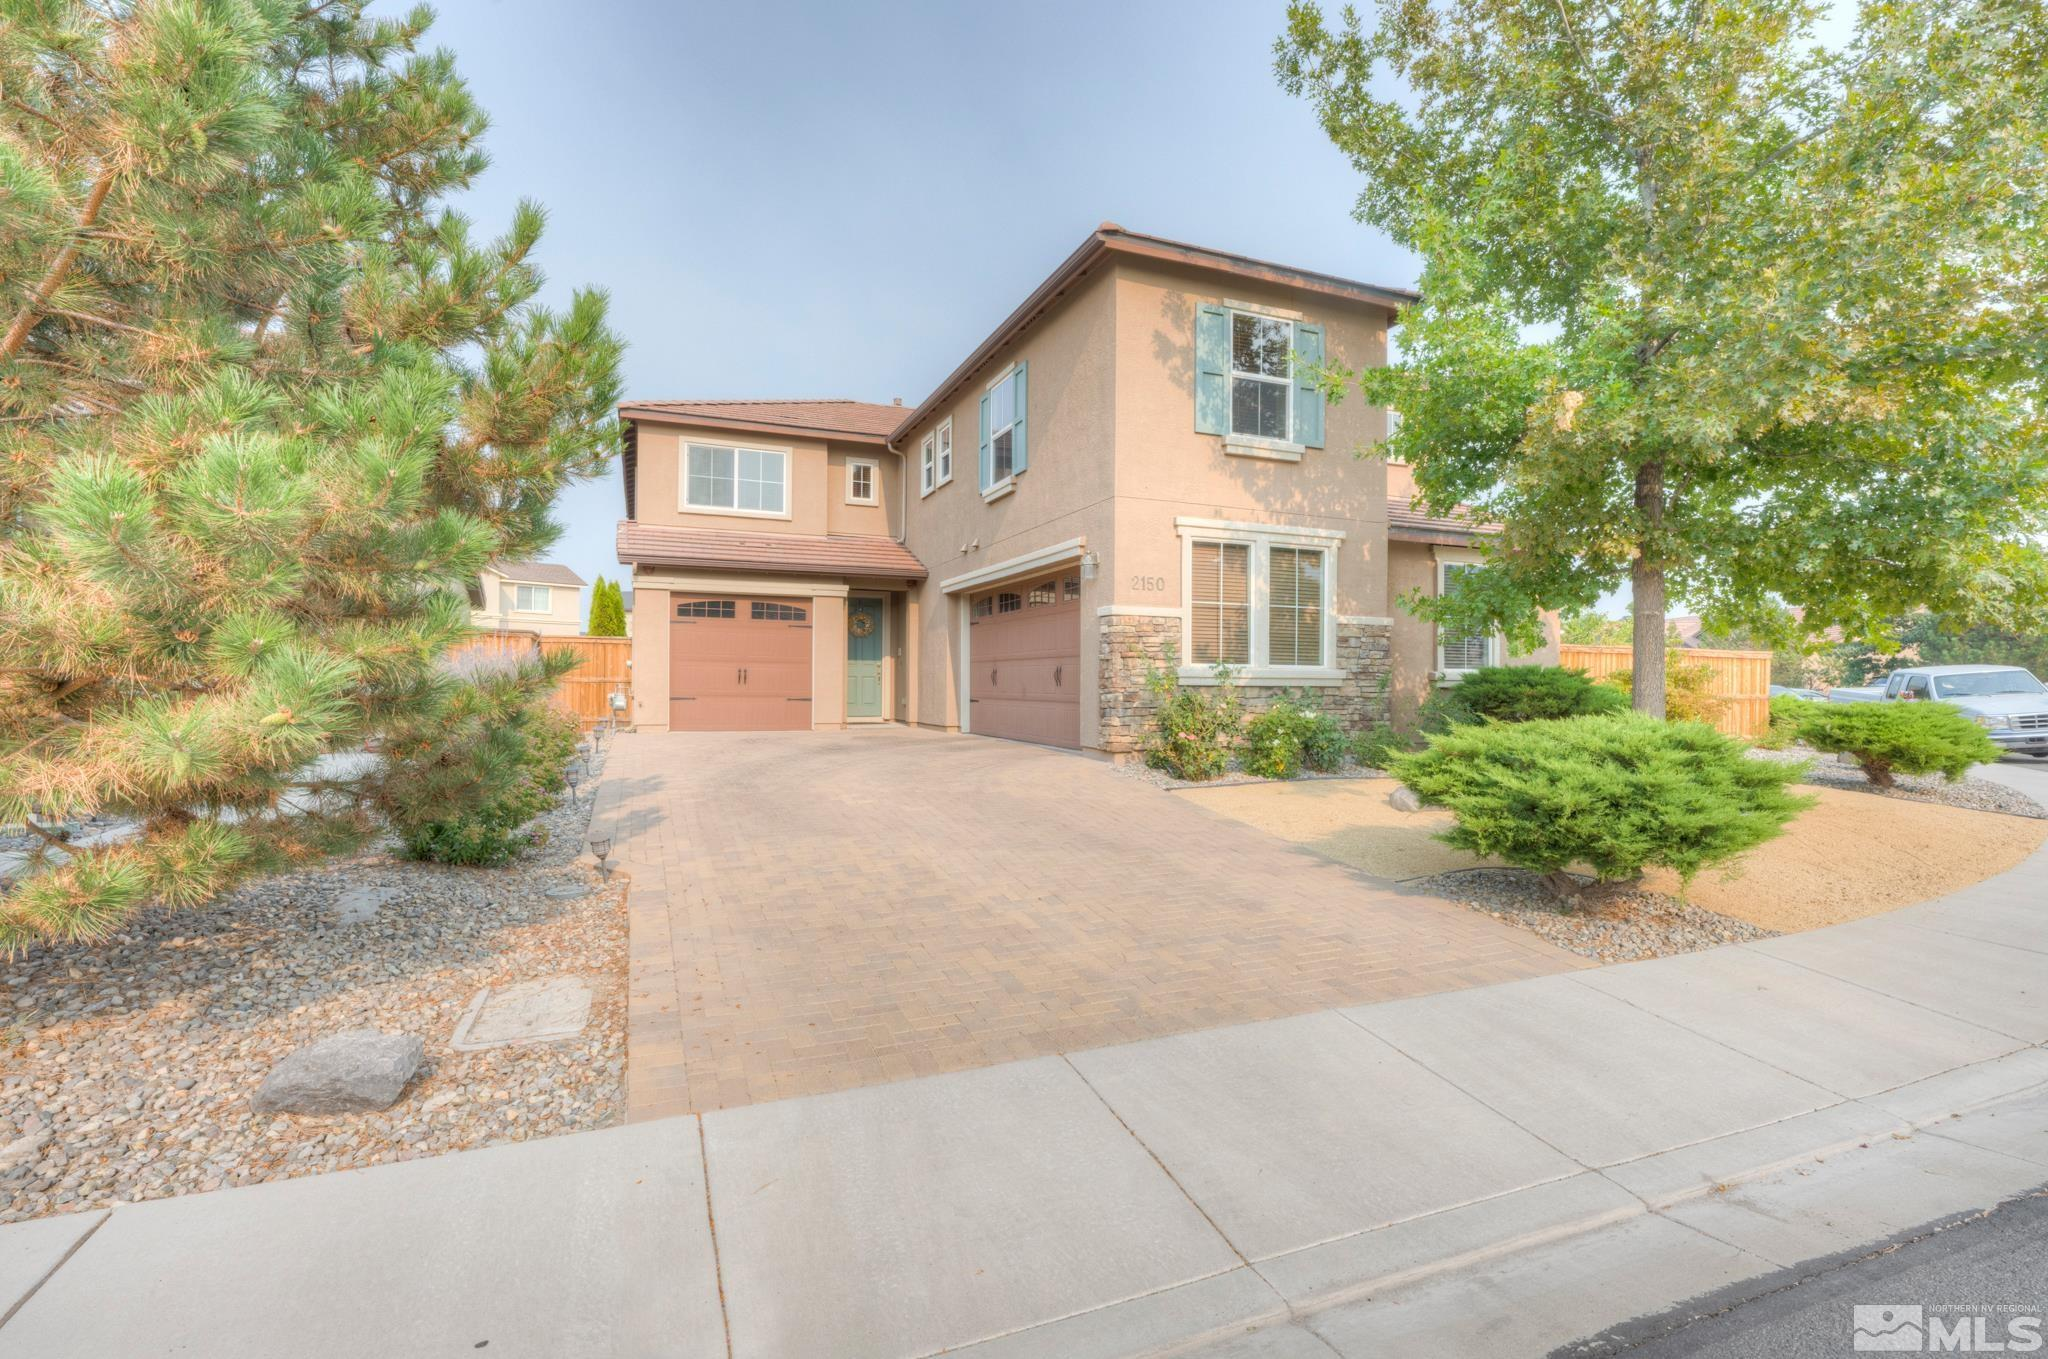 2150 Peaceful Valley, Reno, NV 89521